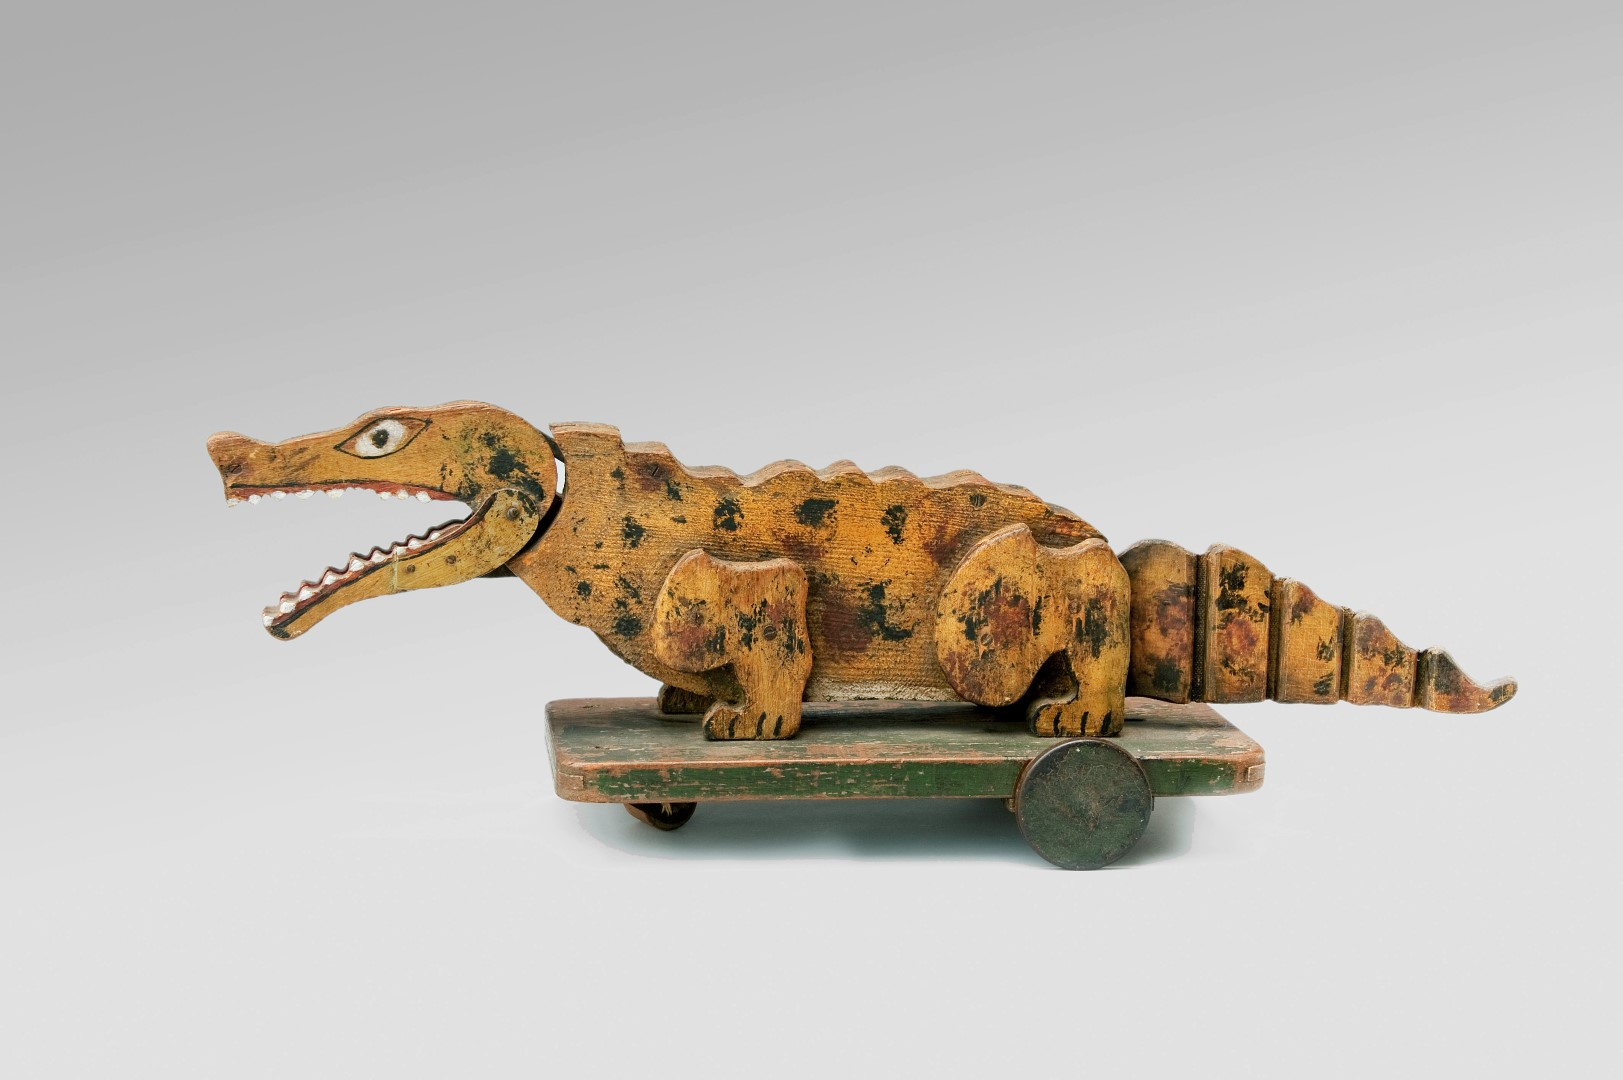 Image of A painted Sopwith Crocodile 1919